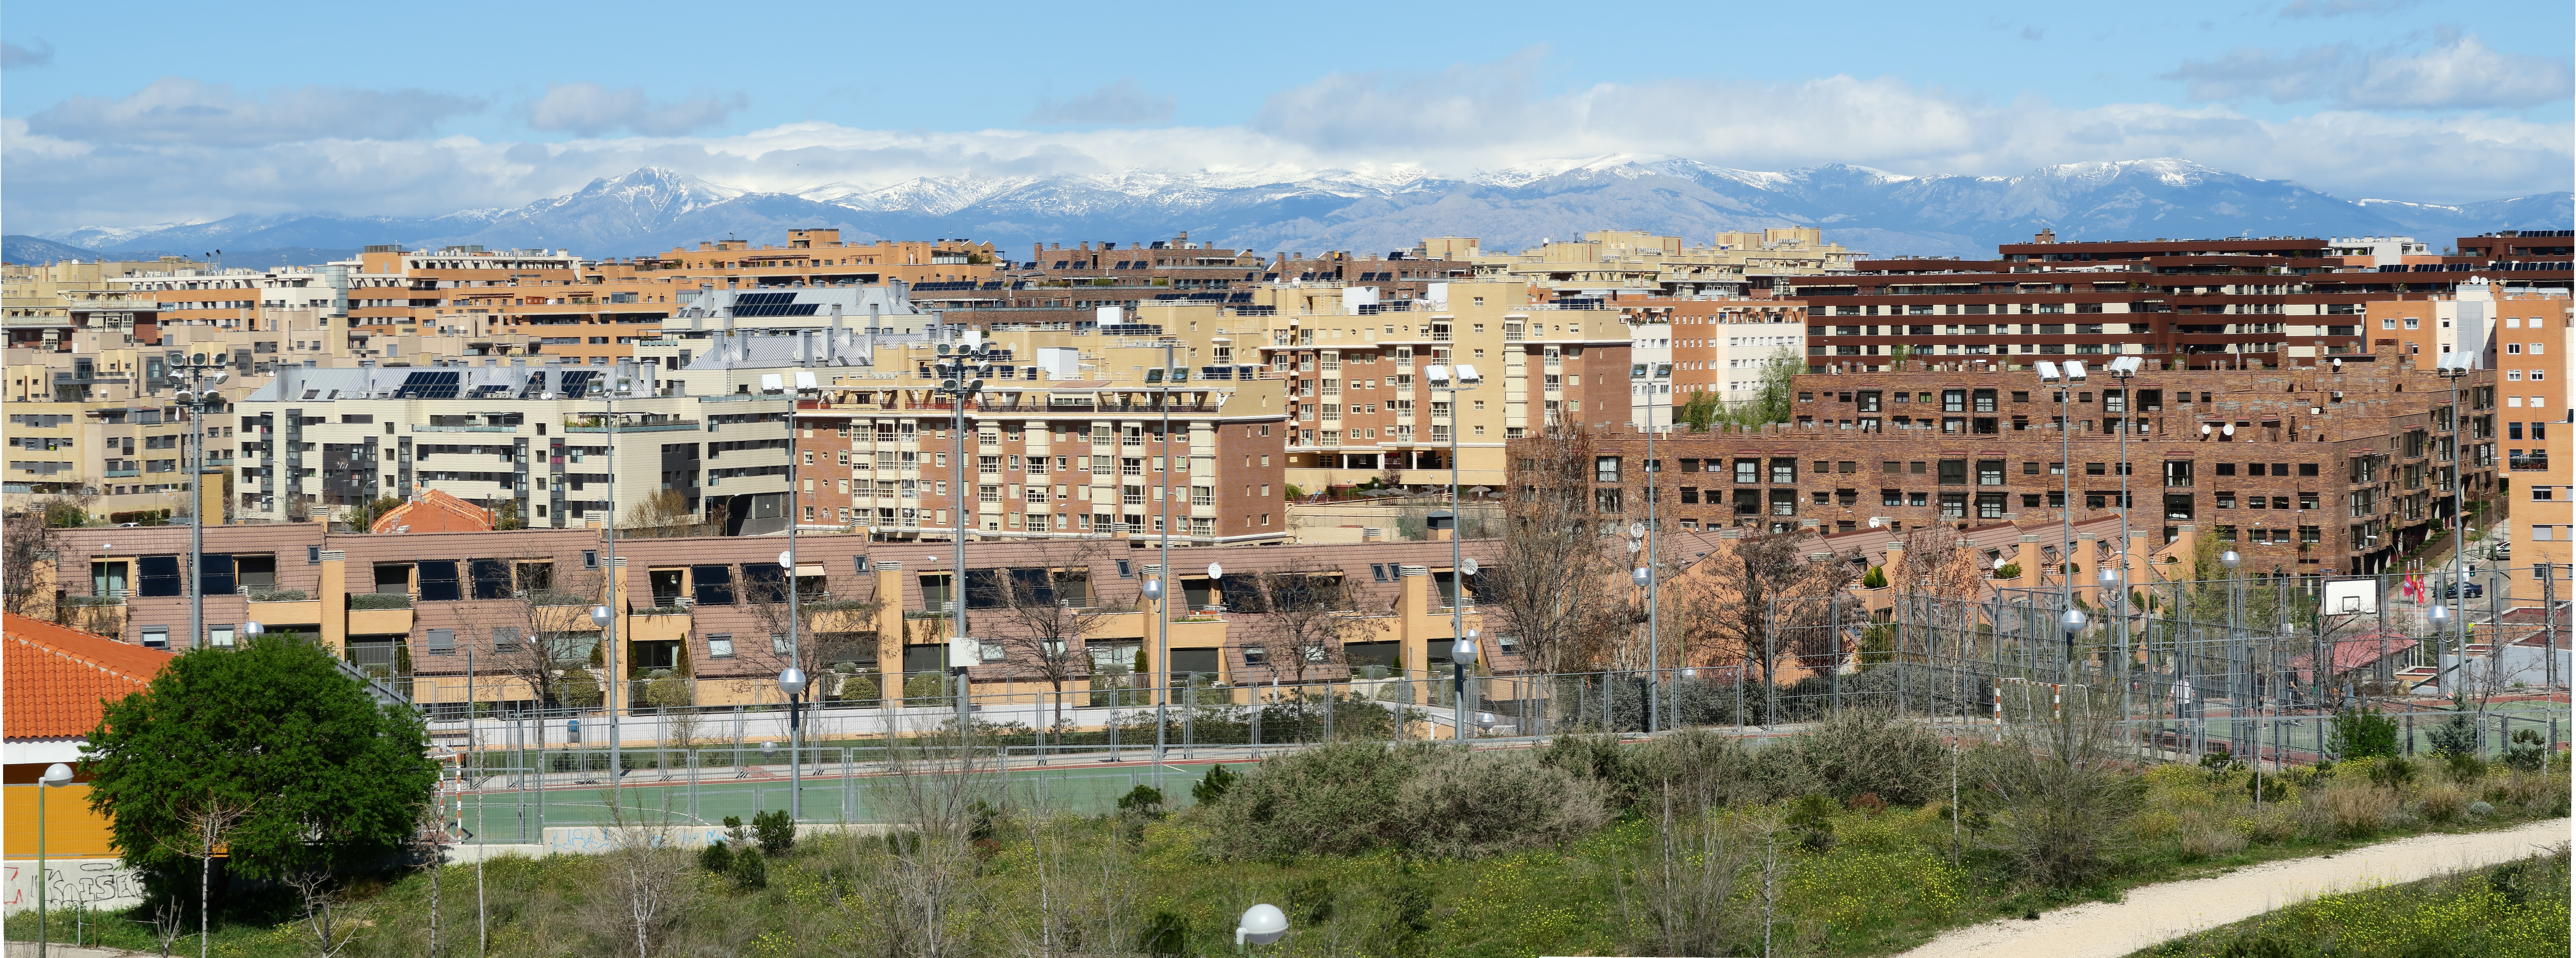 Depiction of Montecarmelo